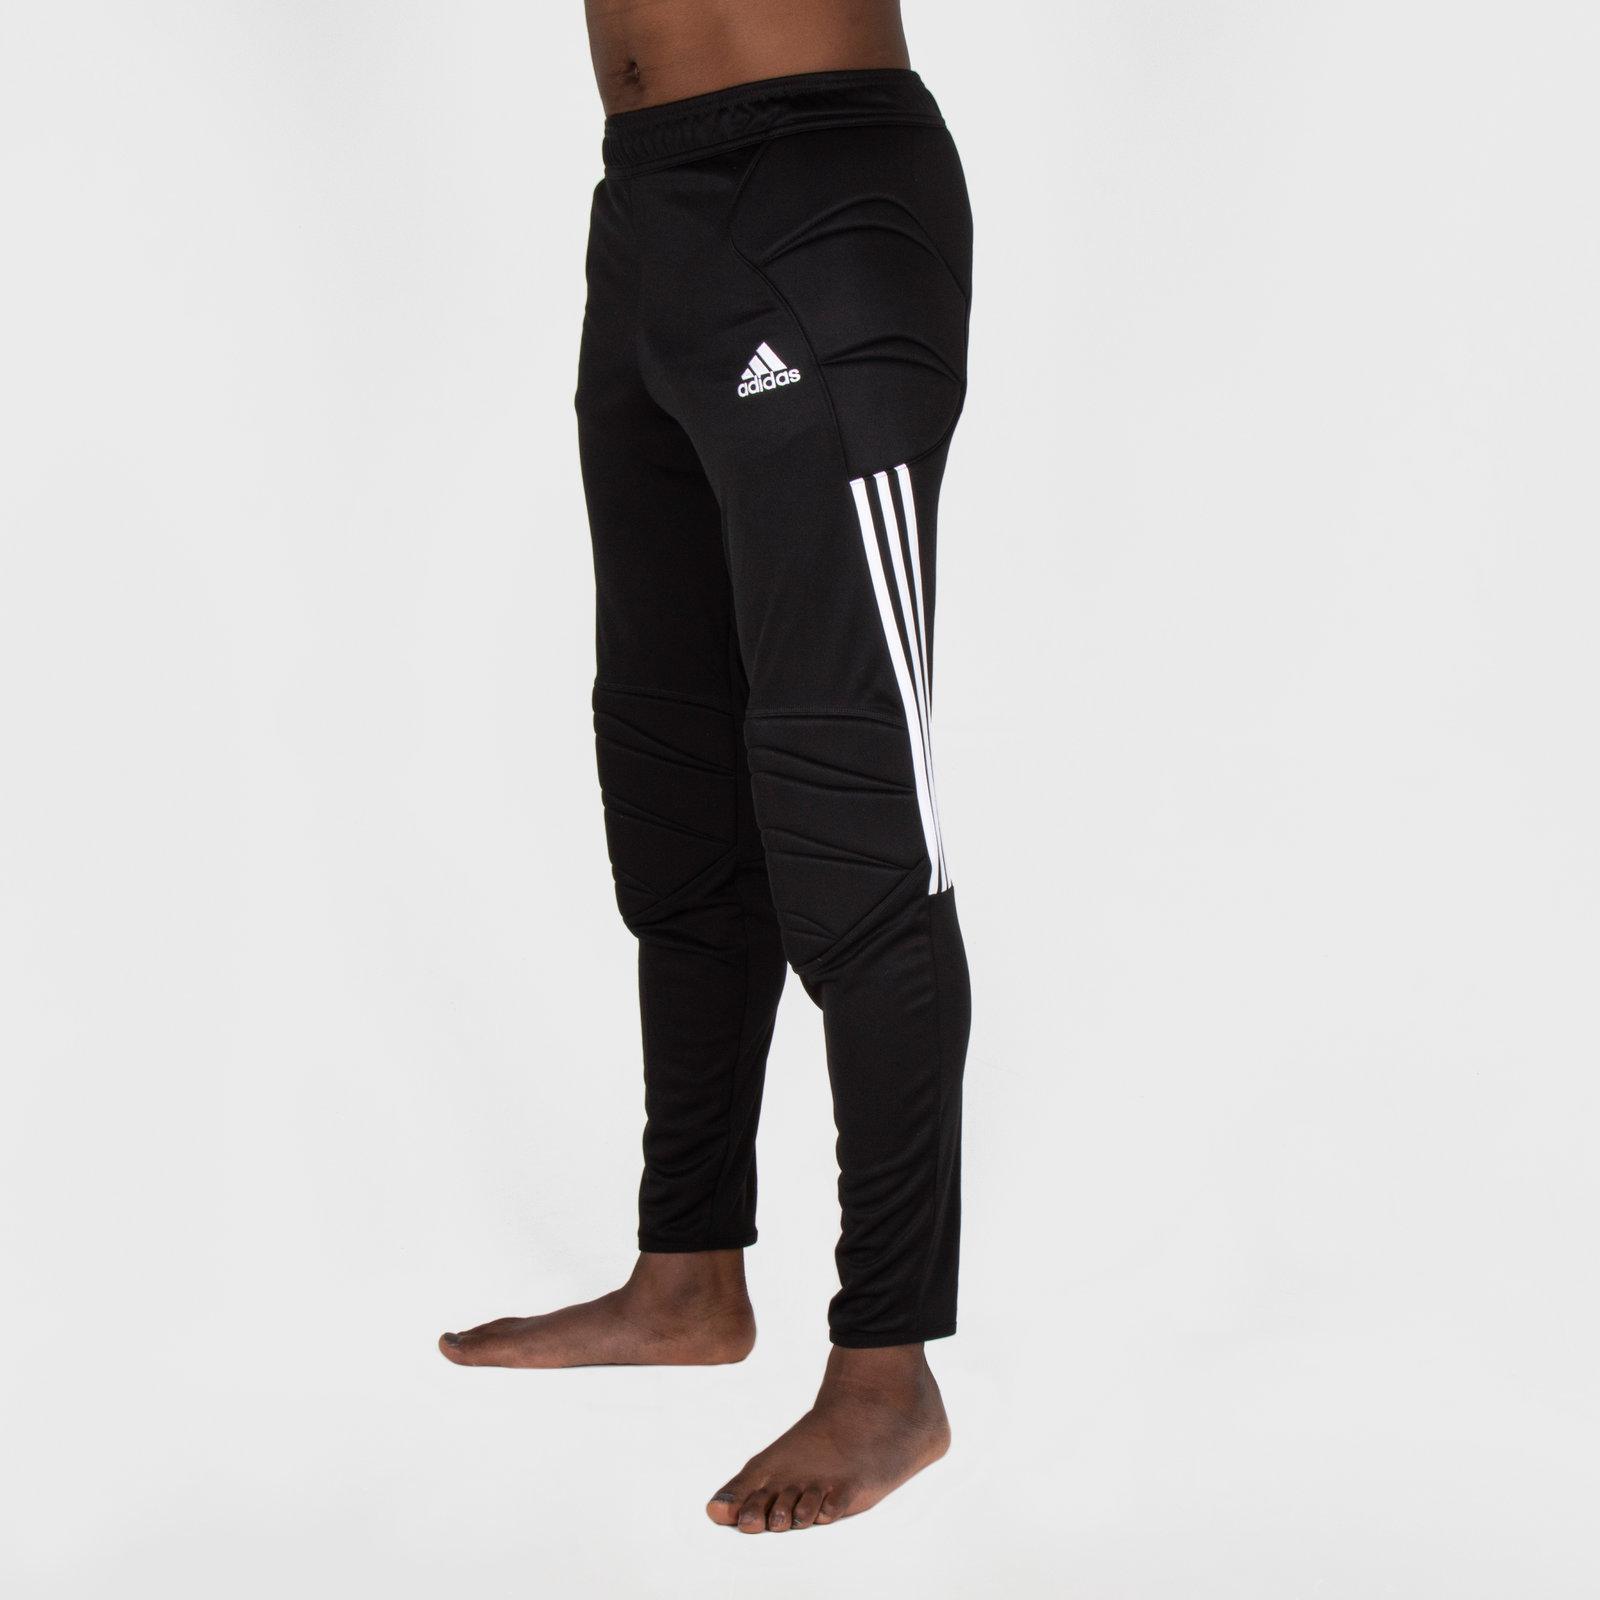 dcfbd5593e8 adidas Mens Tierro 13 Padded Goalkeeper Sports Training Pants Trousers Black